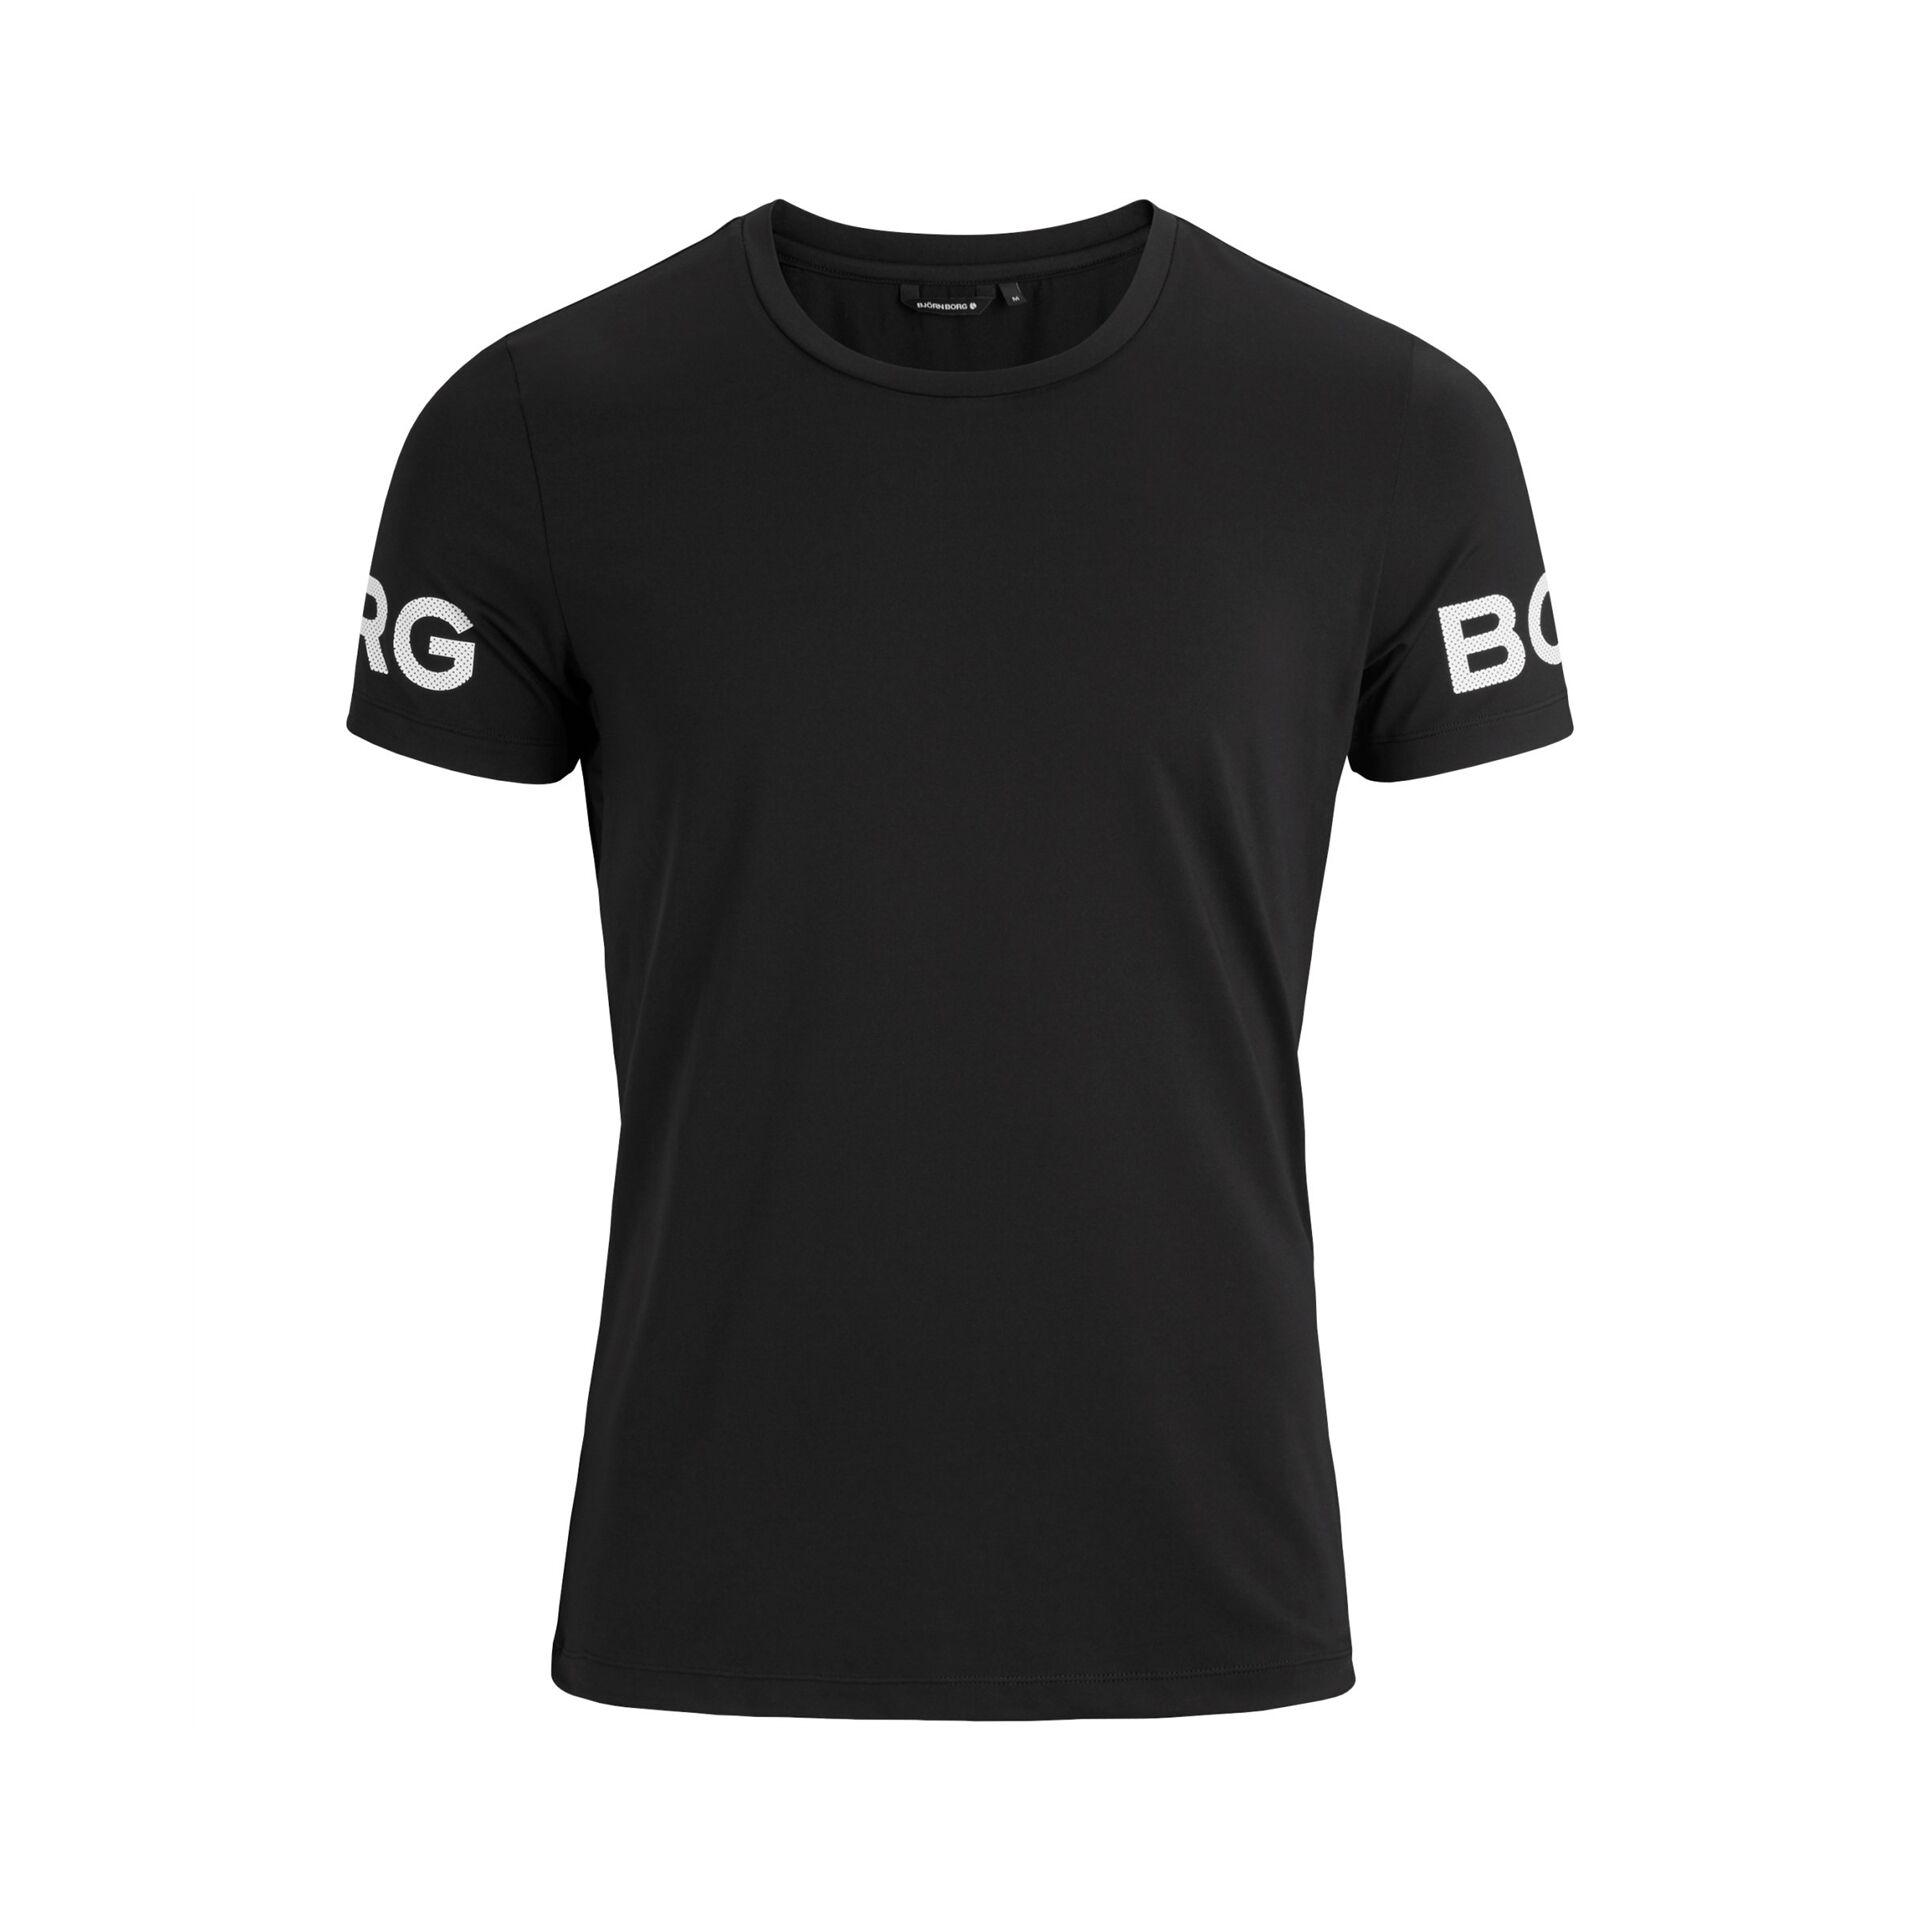 Björn Borg Tee Black Beauty XL